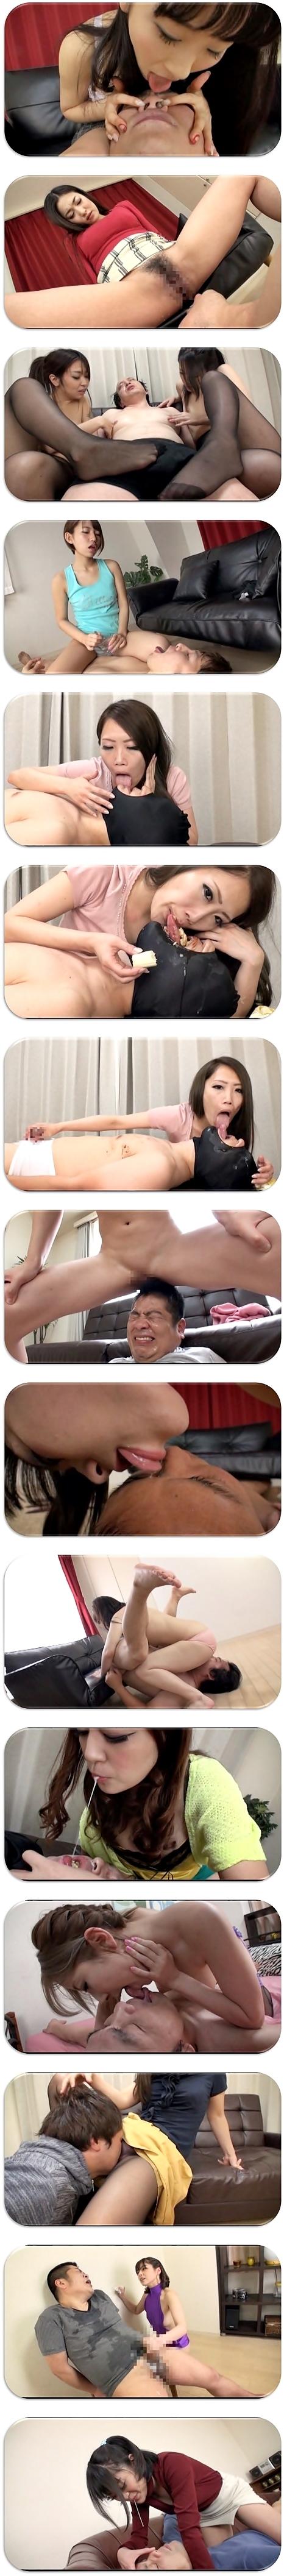 tenngoku 15